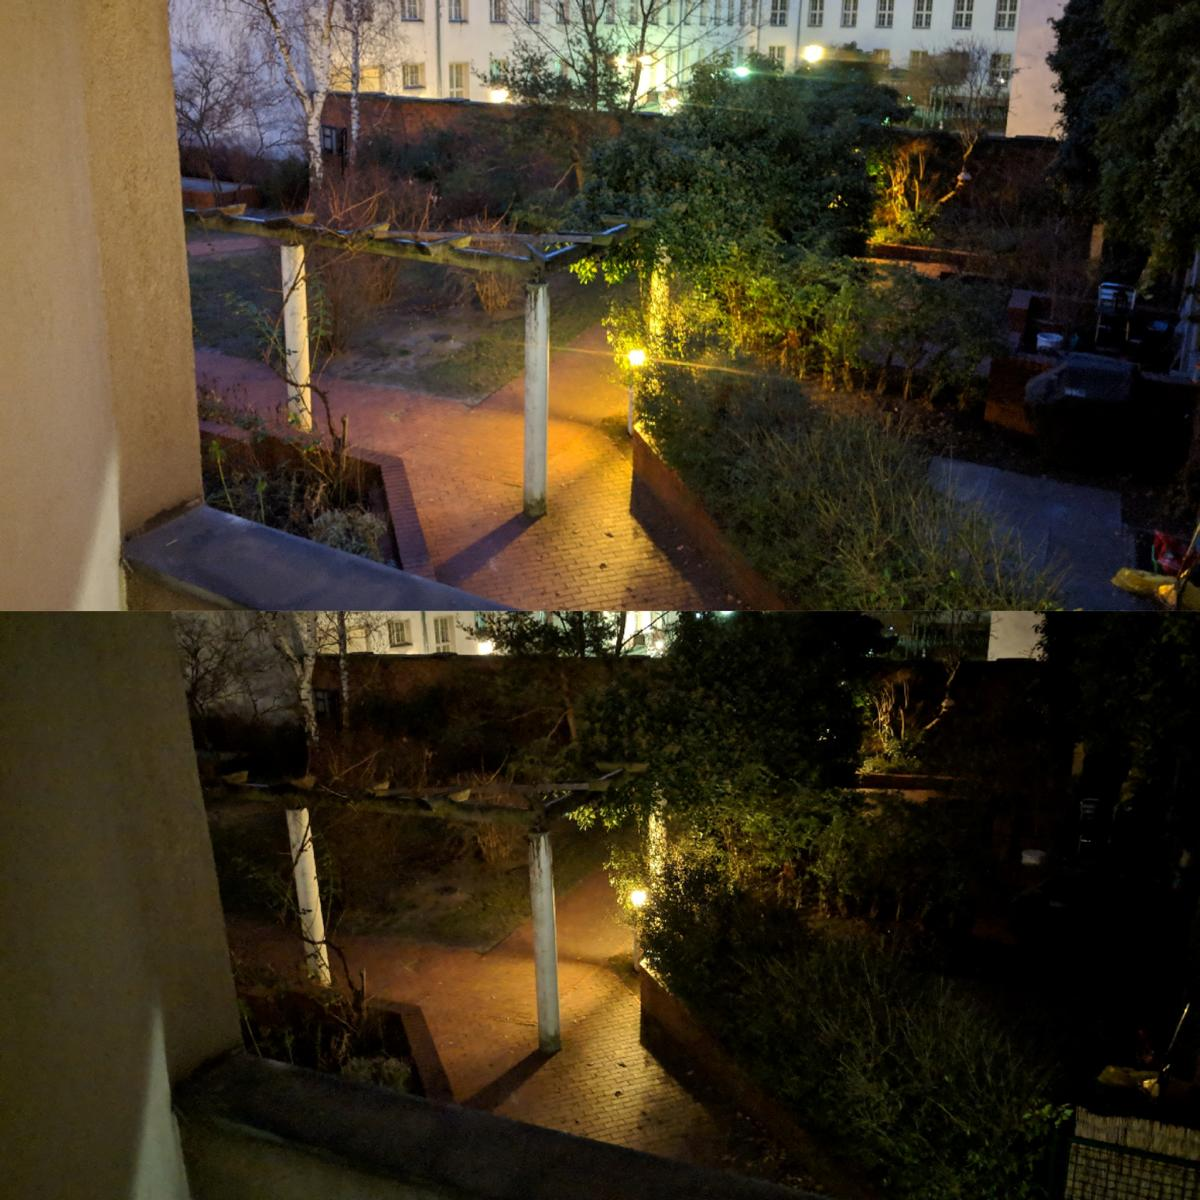 Nokia 8.1 vs Pixel 2